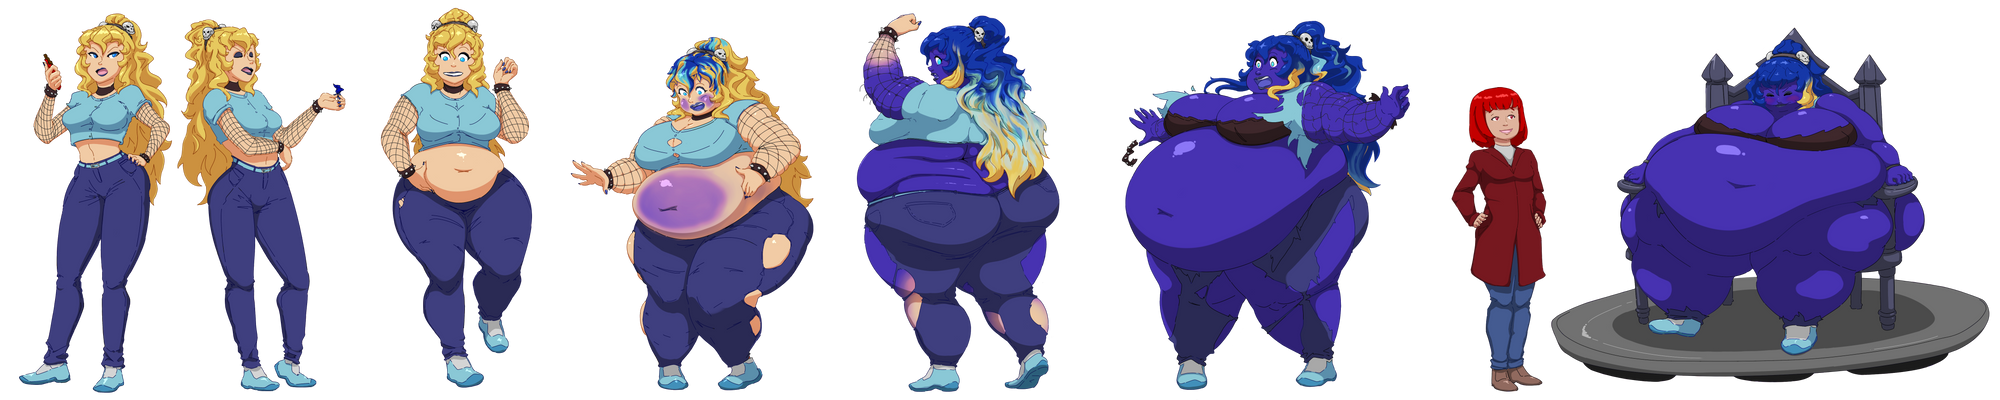 Lilly the Blueberry Brat